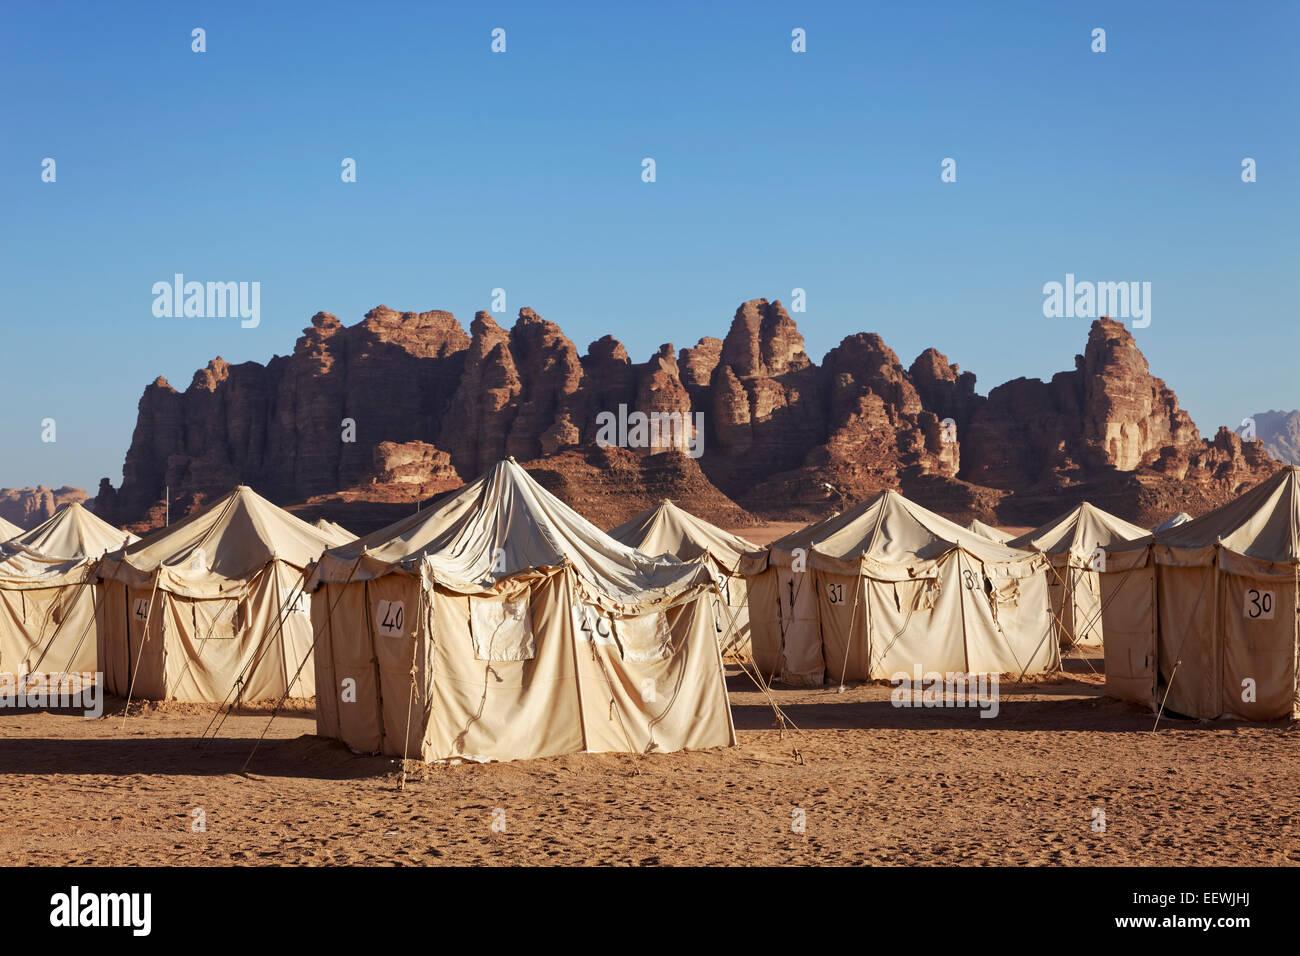 Carpas, campamento para turistas, montañas, Wadi Rum, Jordania Imagen De Stock